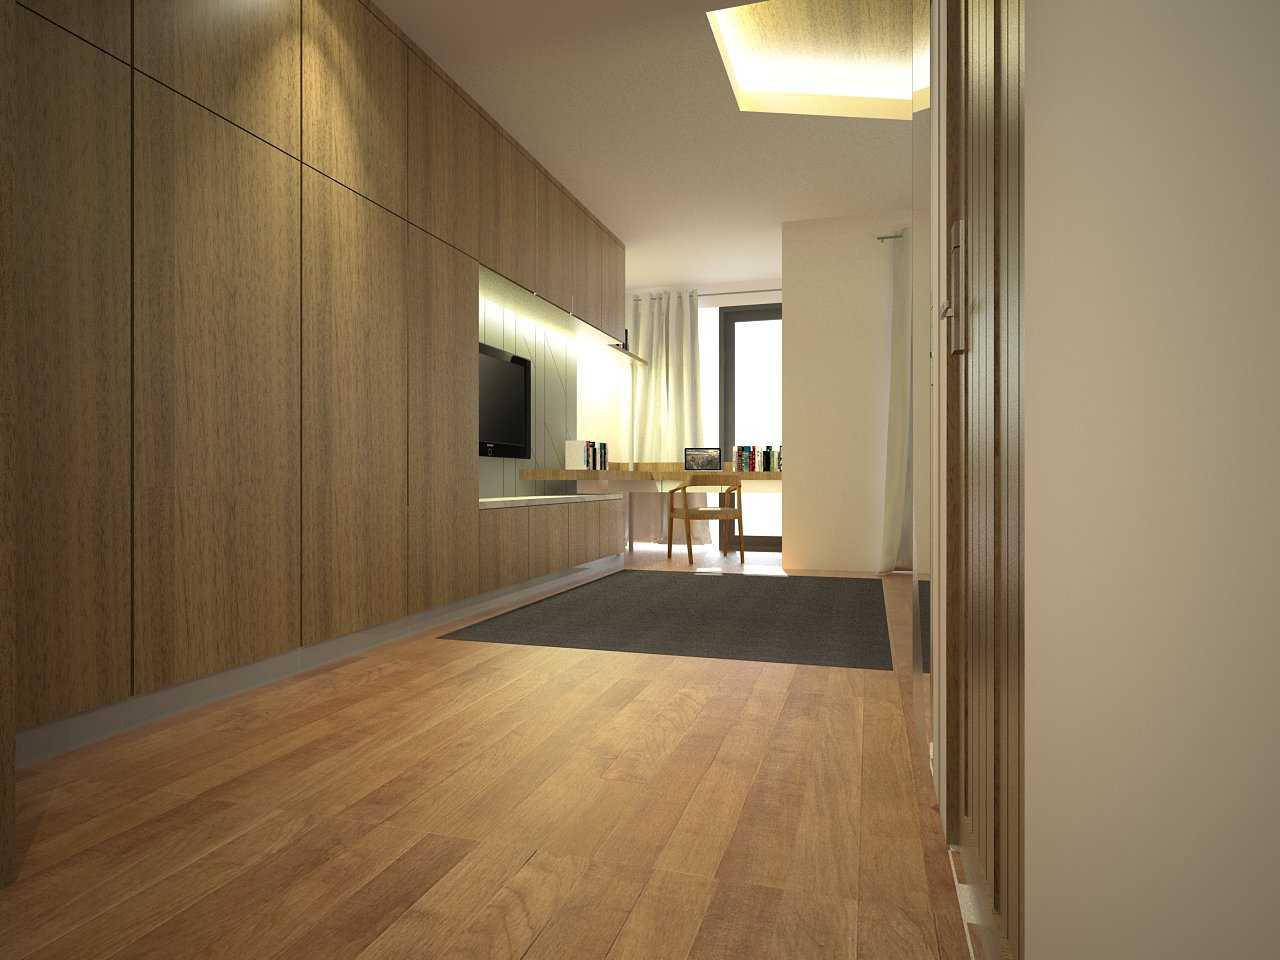 Zigzag Architecture Studio Pulomas House Daerah Khusus Ibukota Jakarta, Indonesia  Masterbed-R2-View03   37600